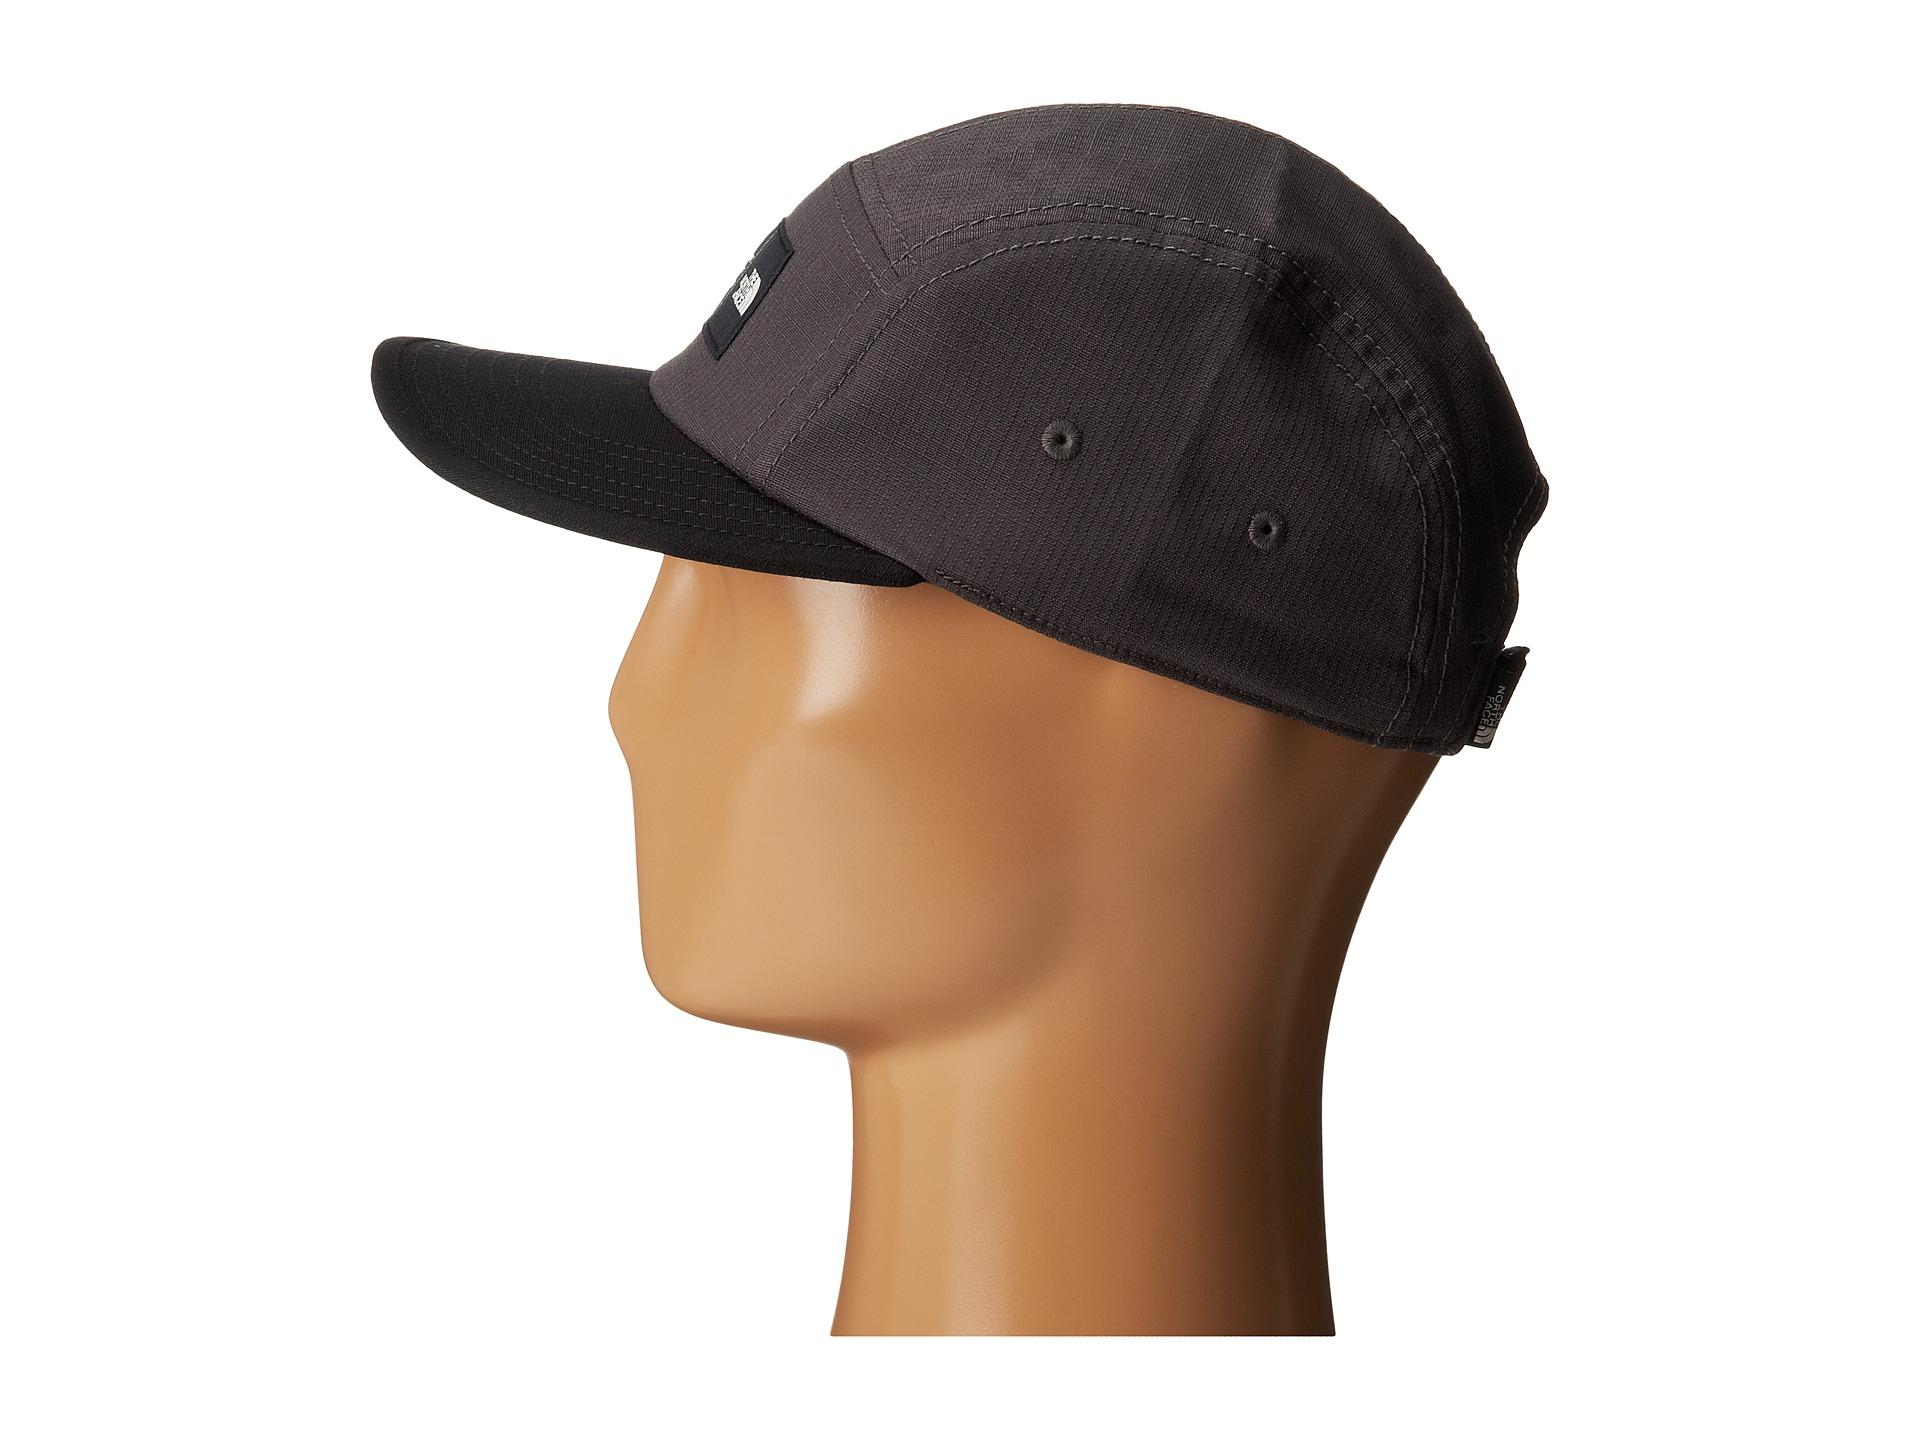 cc9e5a3258e Lyst - The North Face Five Panel Ball Cap in Gray for Men